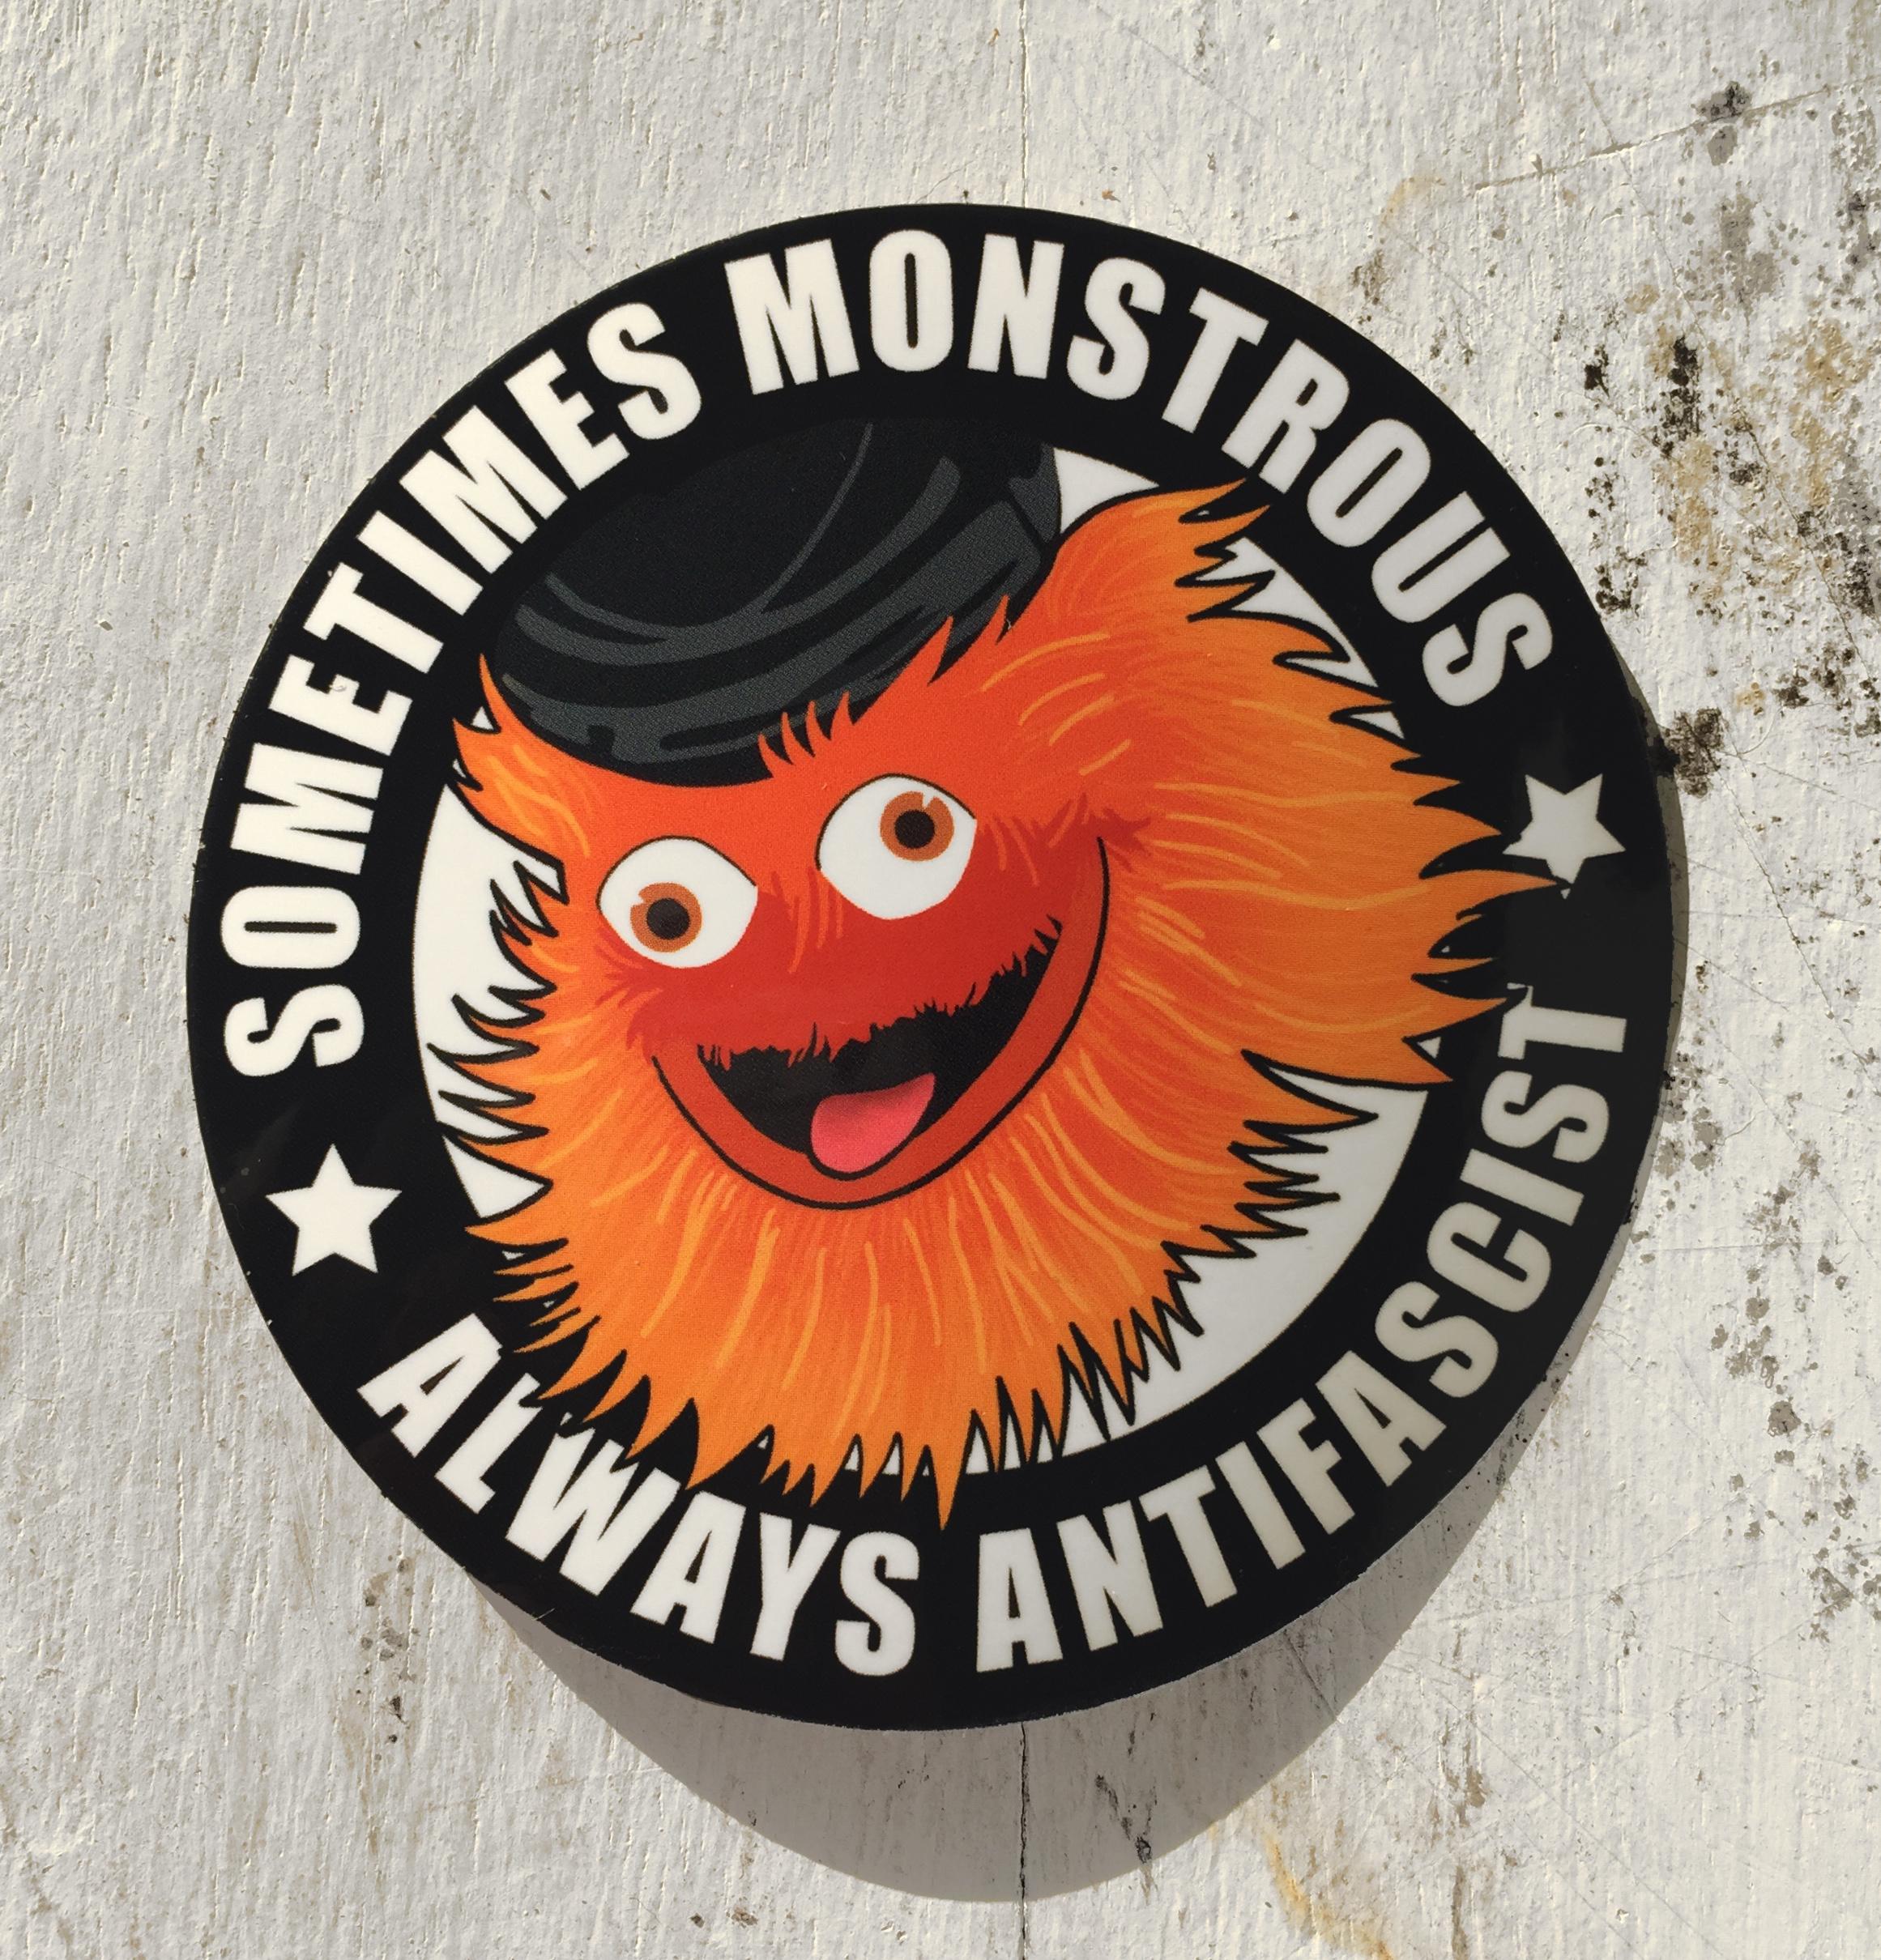 Antifa Gritty sticker from Stuffs by Zola